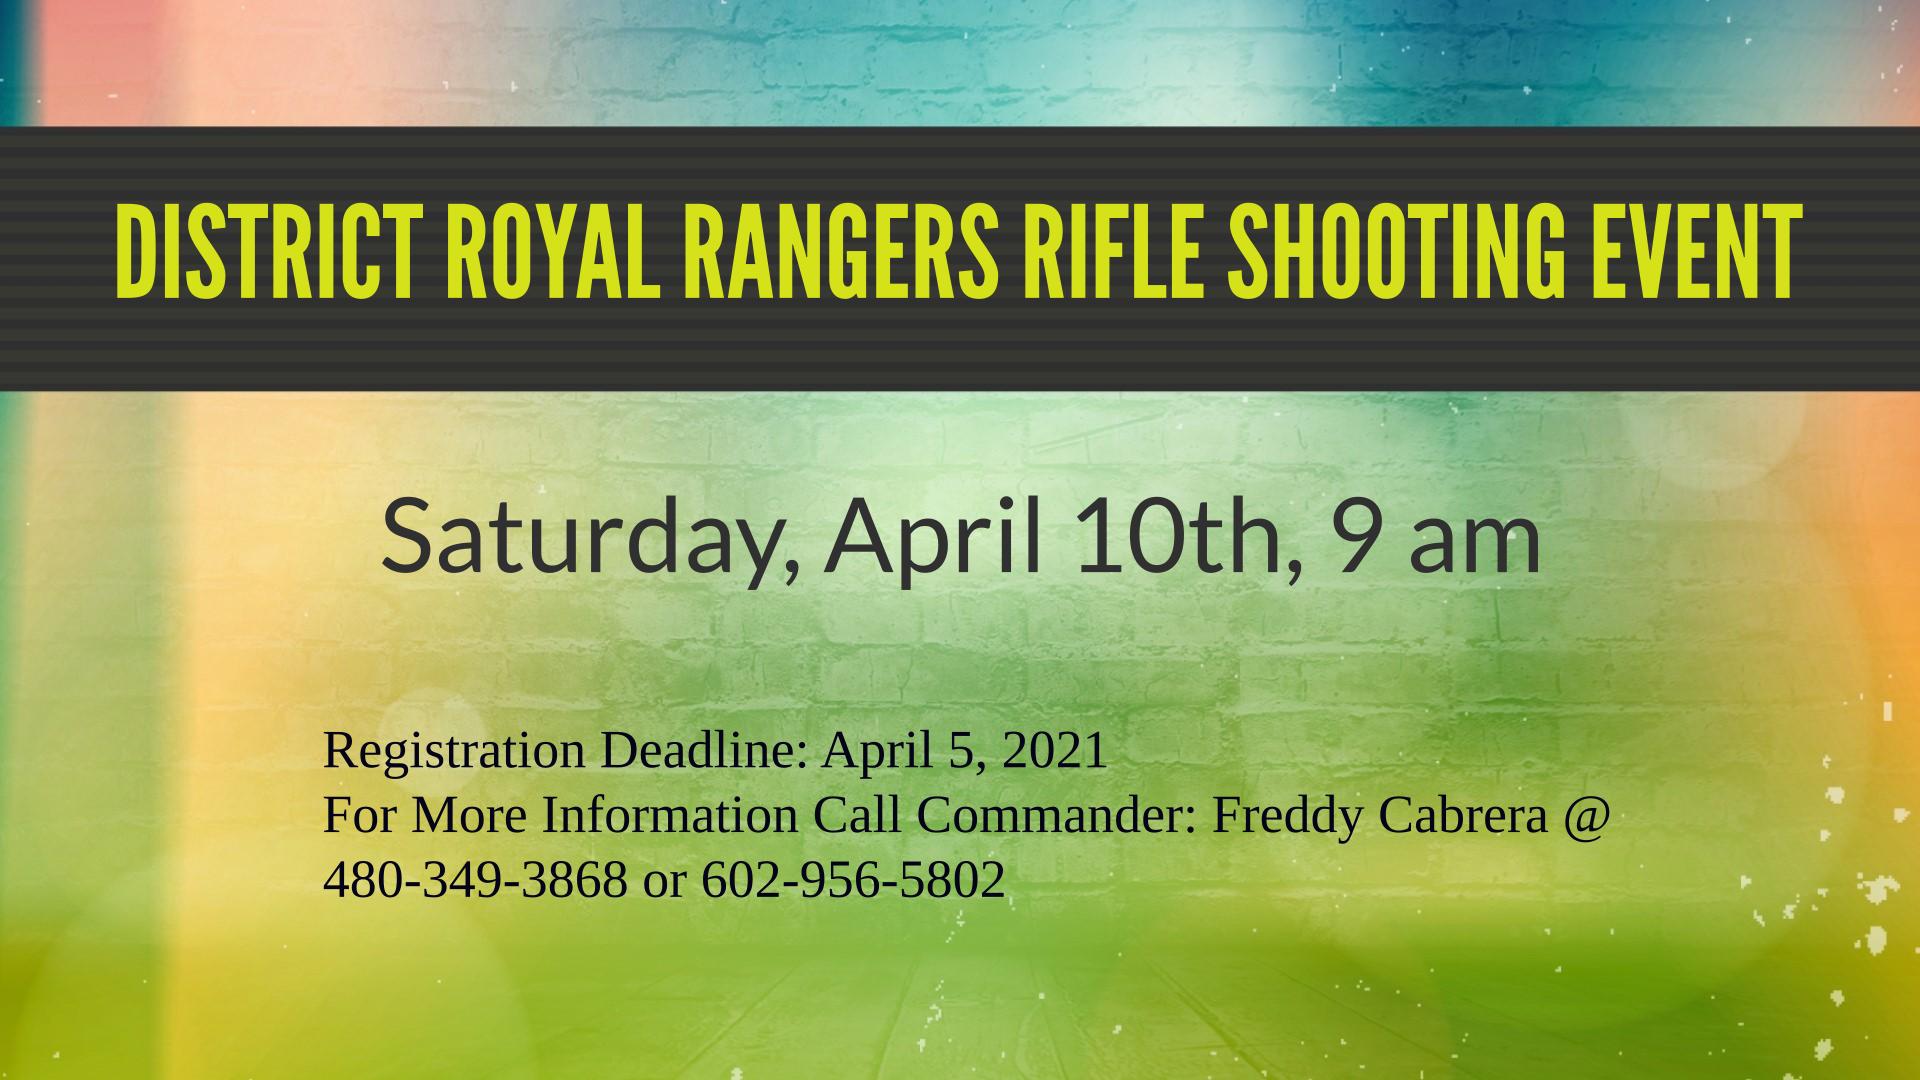 District Royal Rangers Rifle Shooting Event